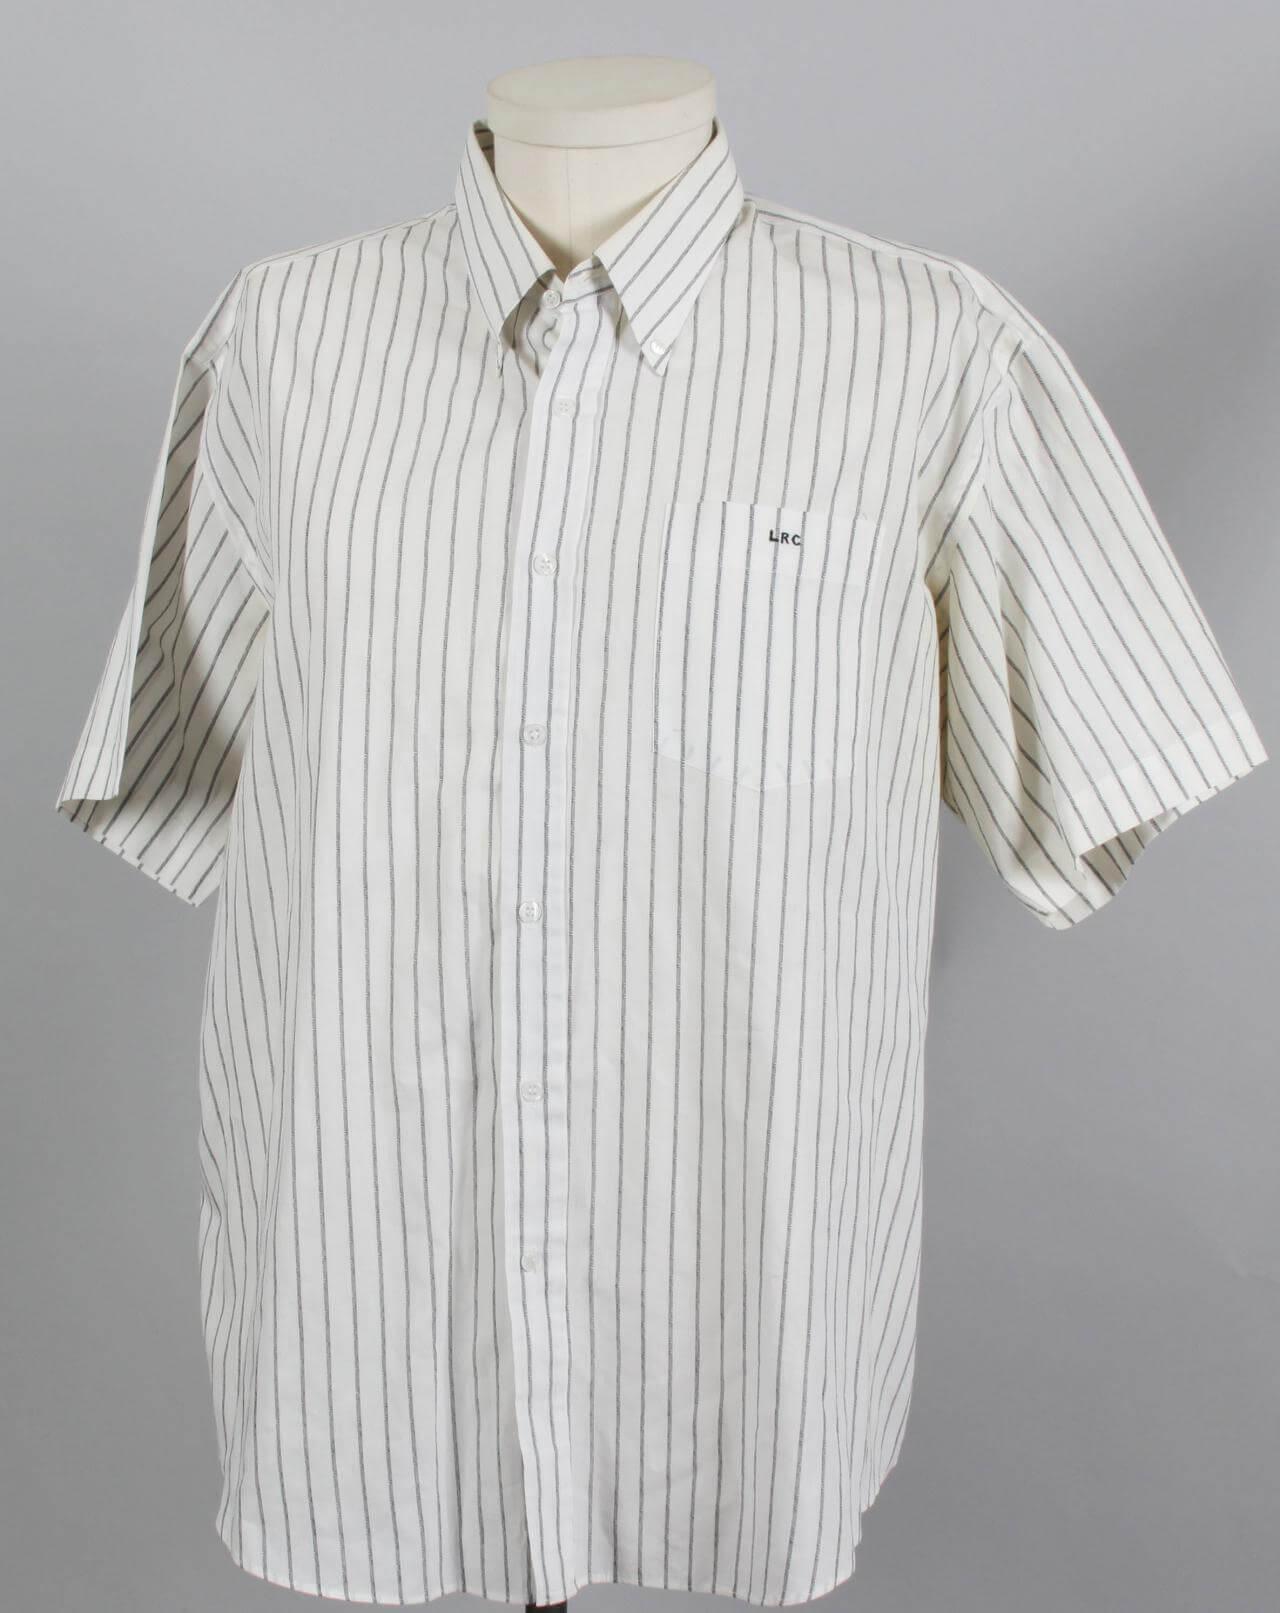 Larry Csonka Personal Worn Shirt Dolphins - COA